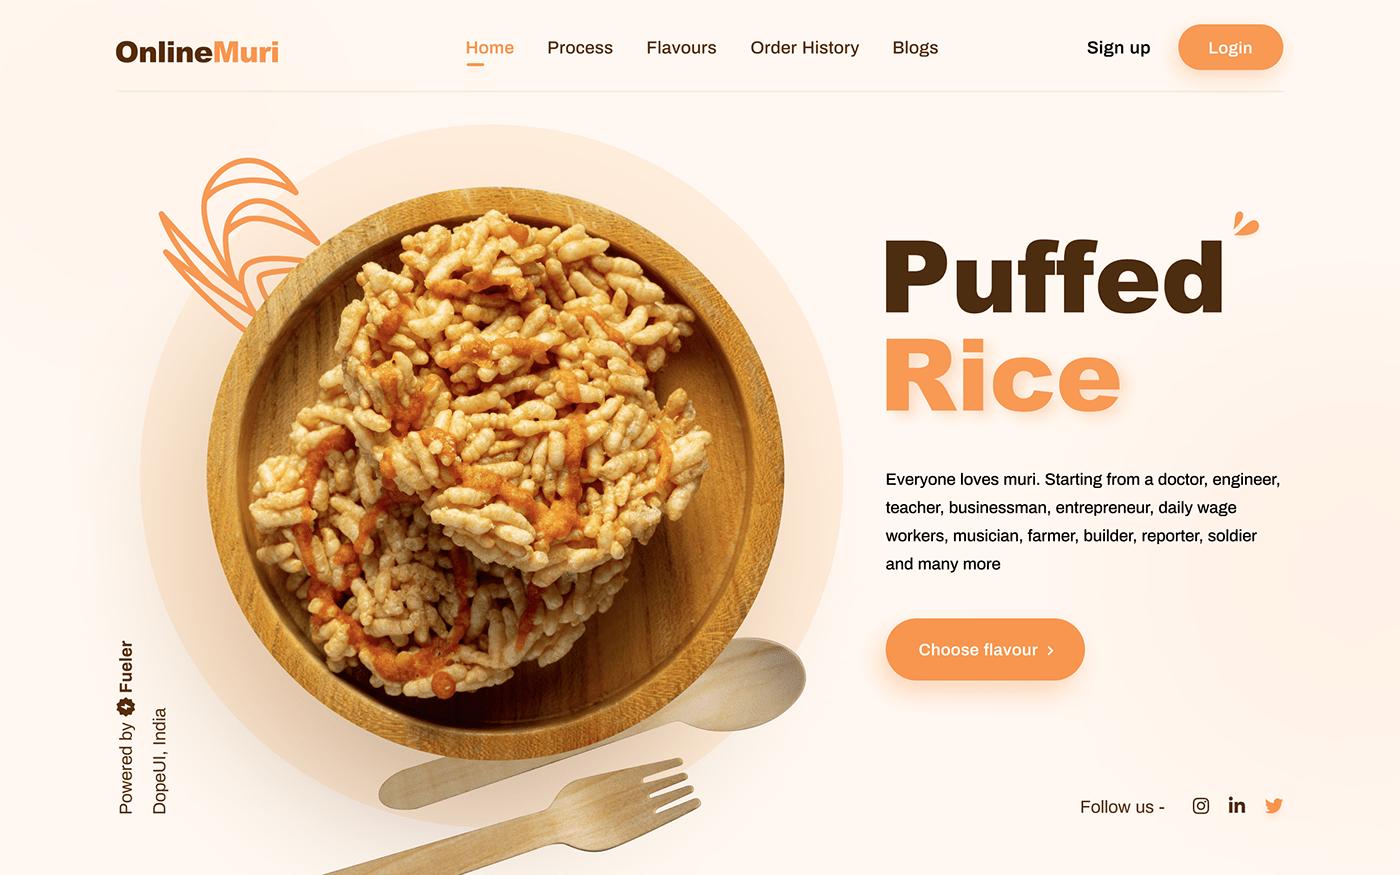 branding  Clean UI design Minimalism puffed rice ui designs UI/UX UX Designs web designs Website Design